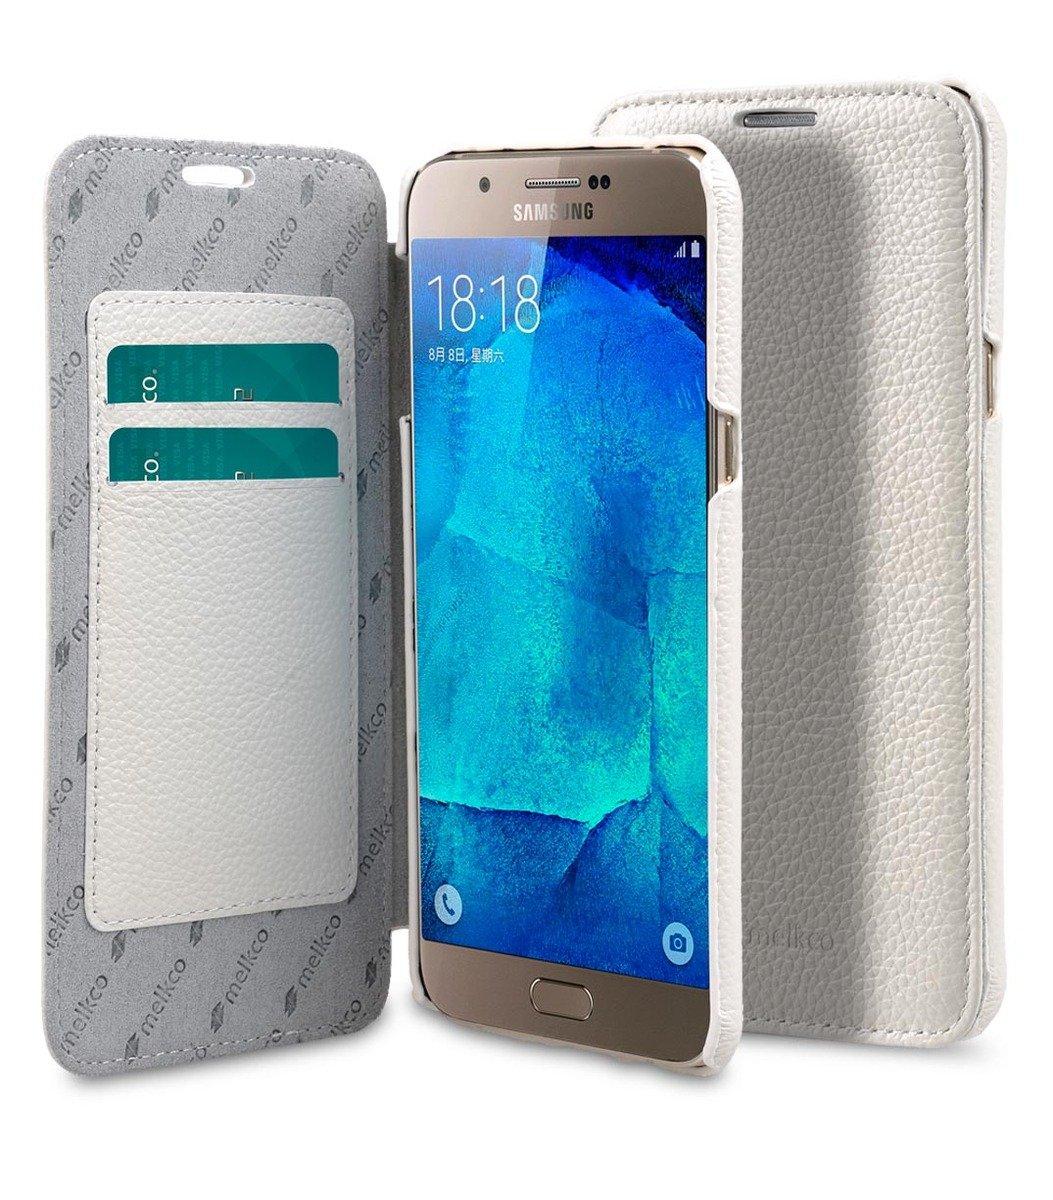 Samsung Galaxy A8 Face Cover Book Type 高級真皮革手機套 - 白色荔枝紋